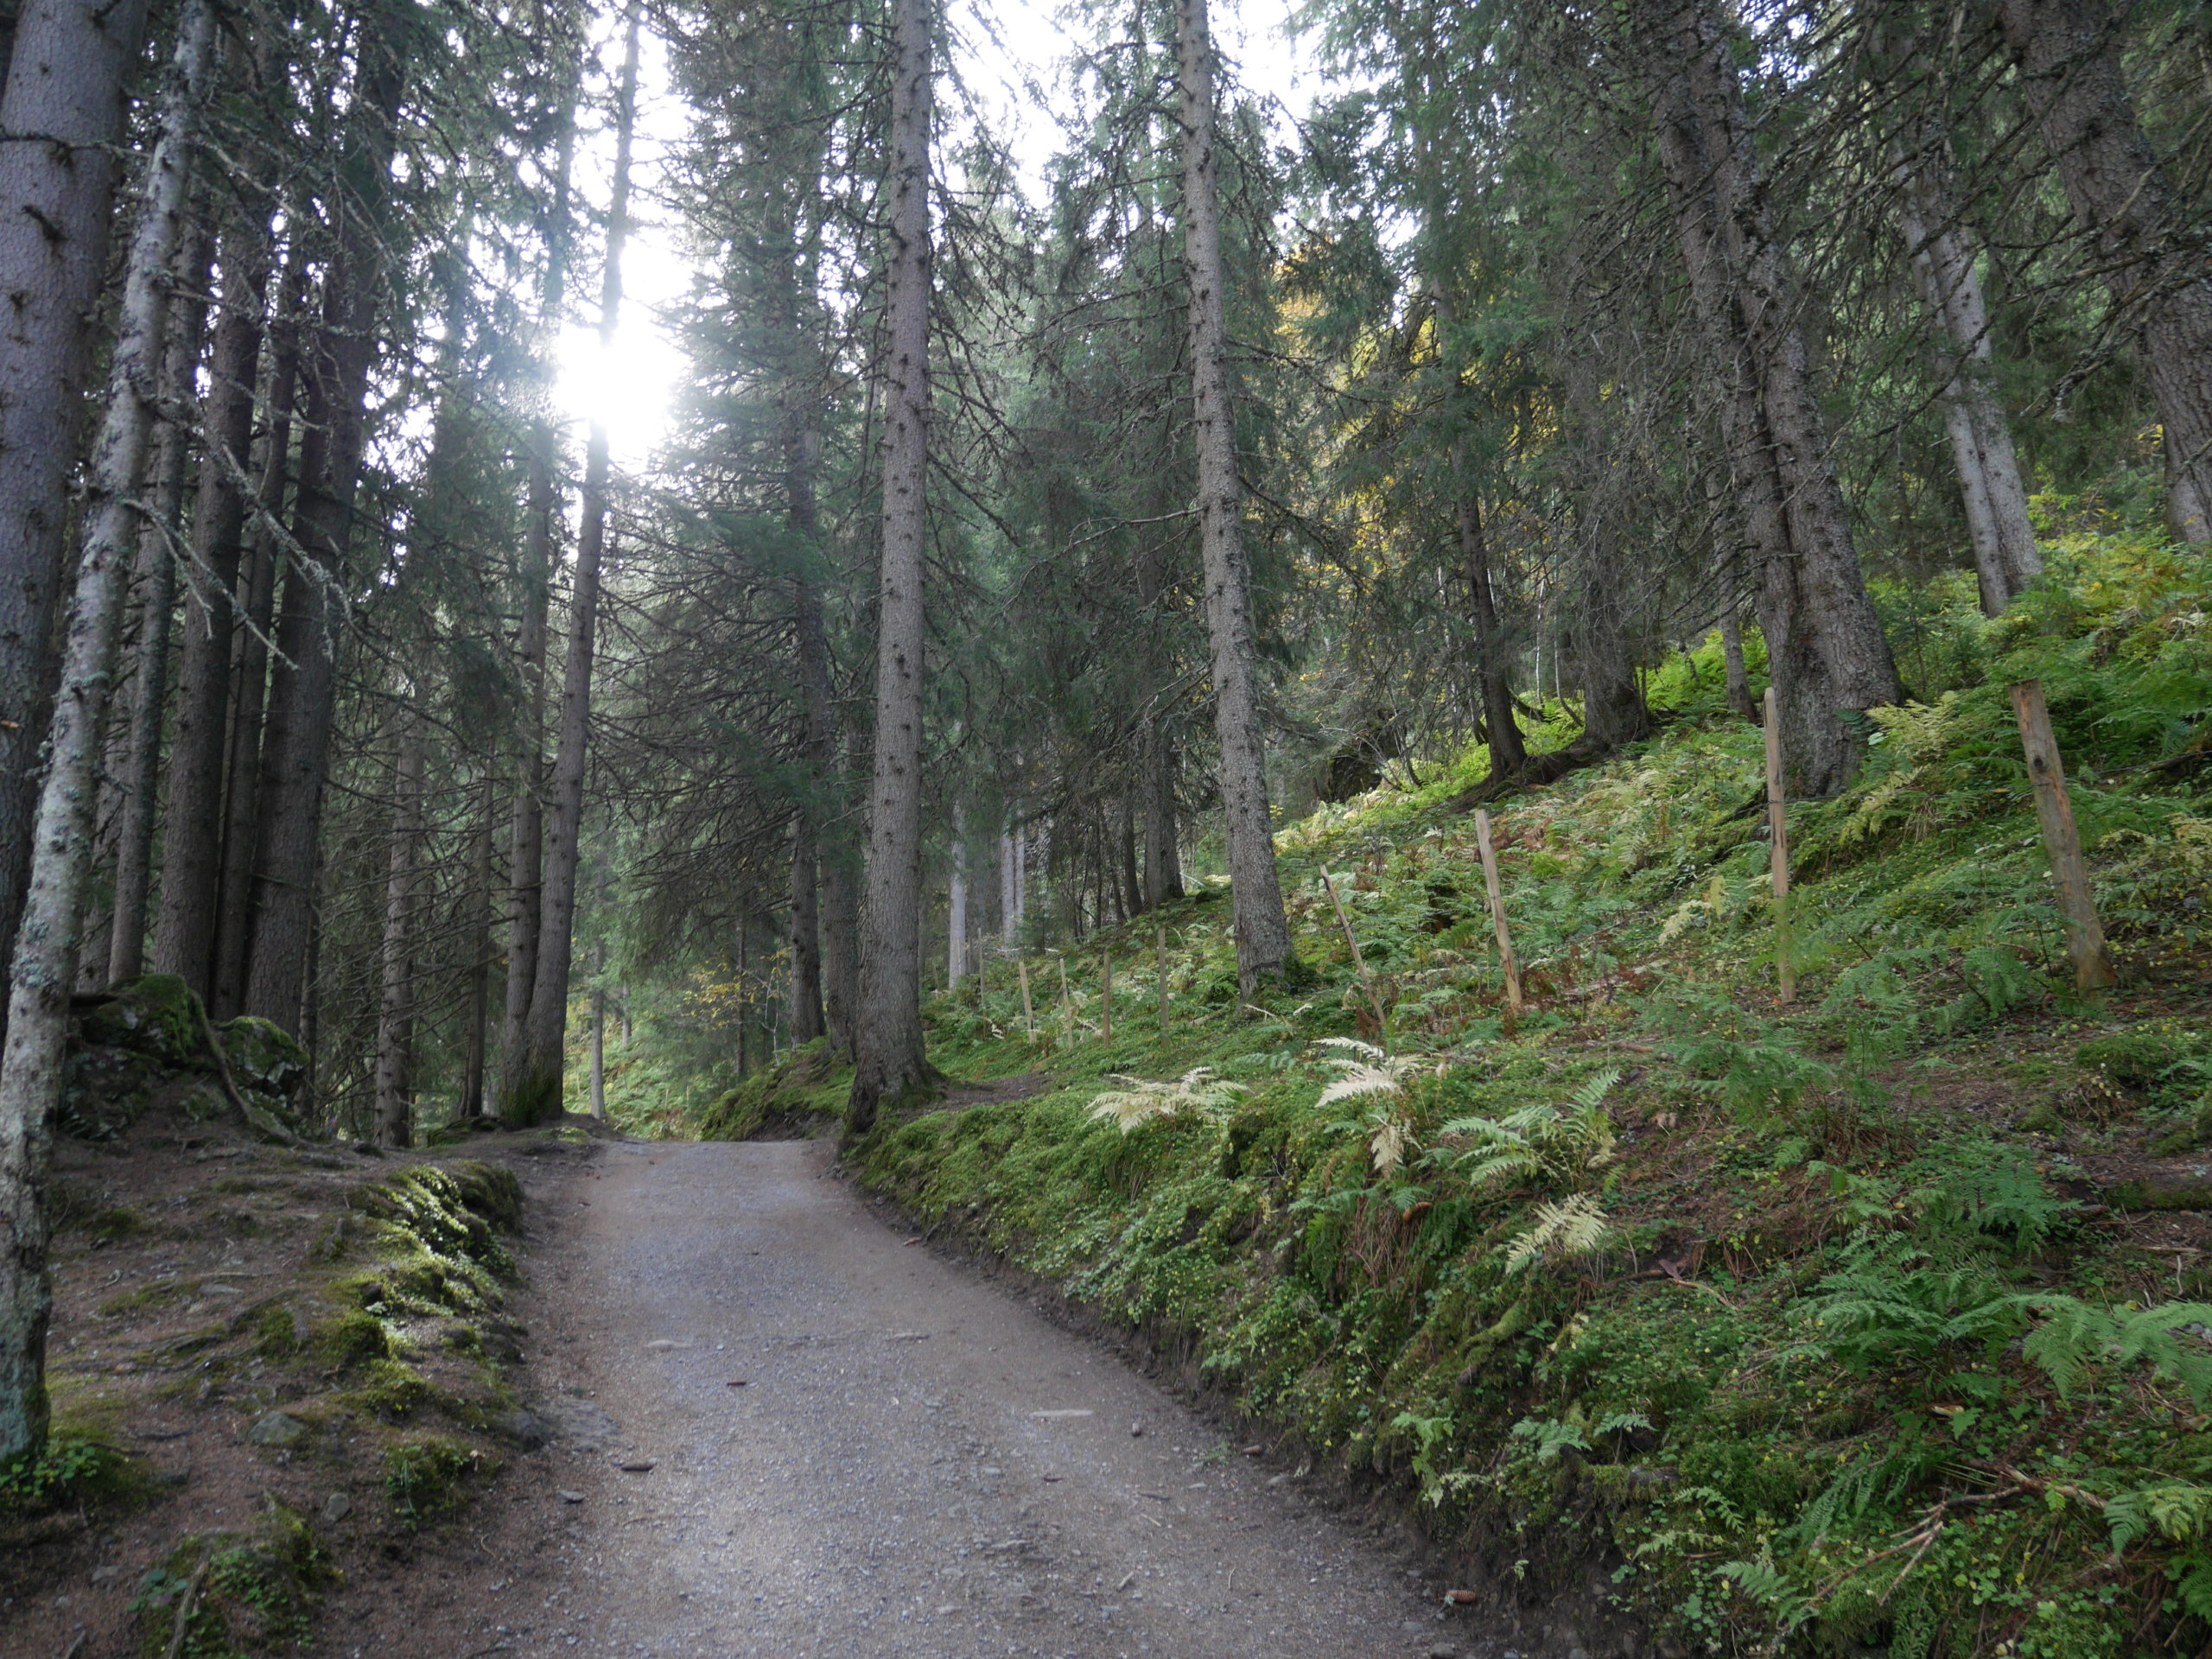 Lauterbrunnen svizzera tedesca sara caulfield